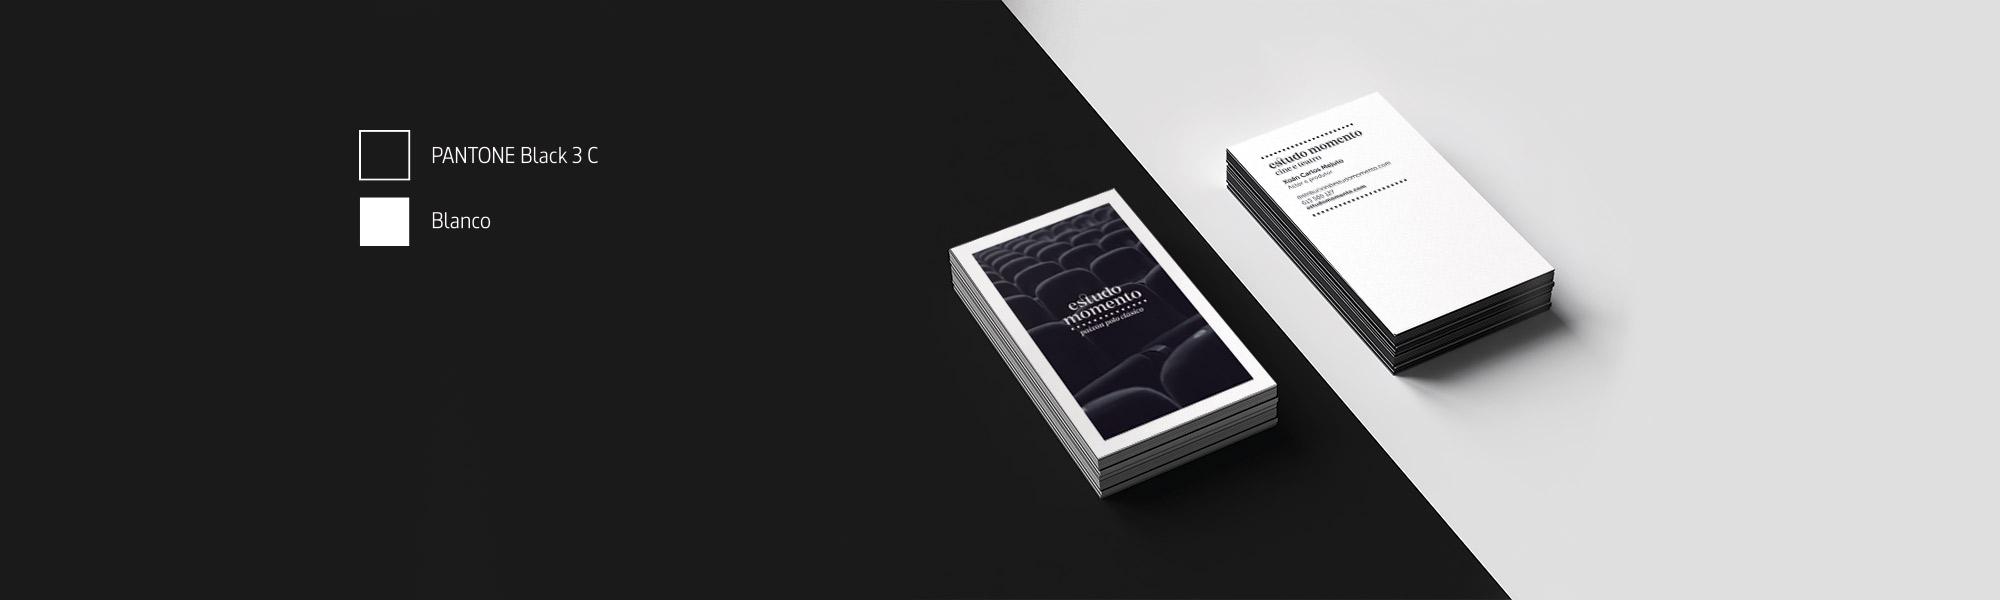 Diseño de tarjetas corporativas para Estudo Momento